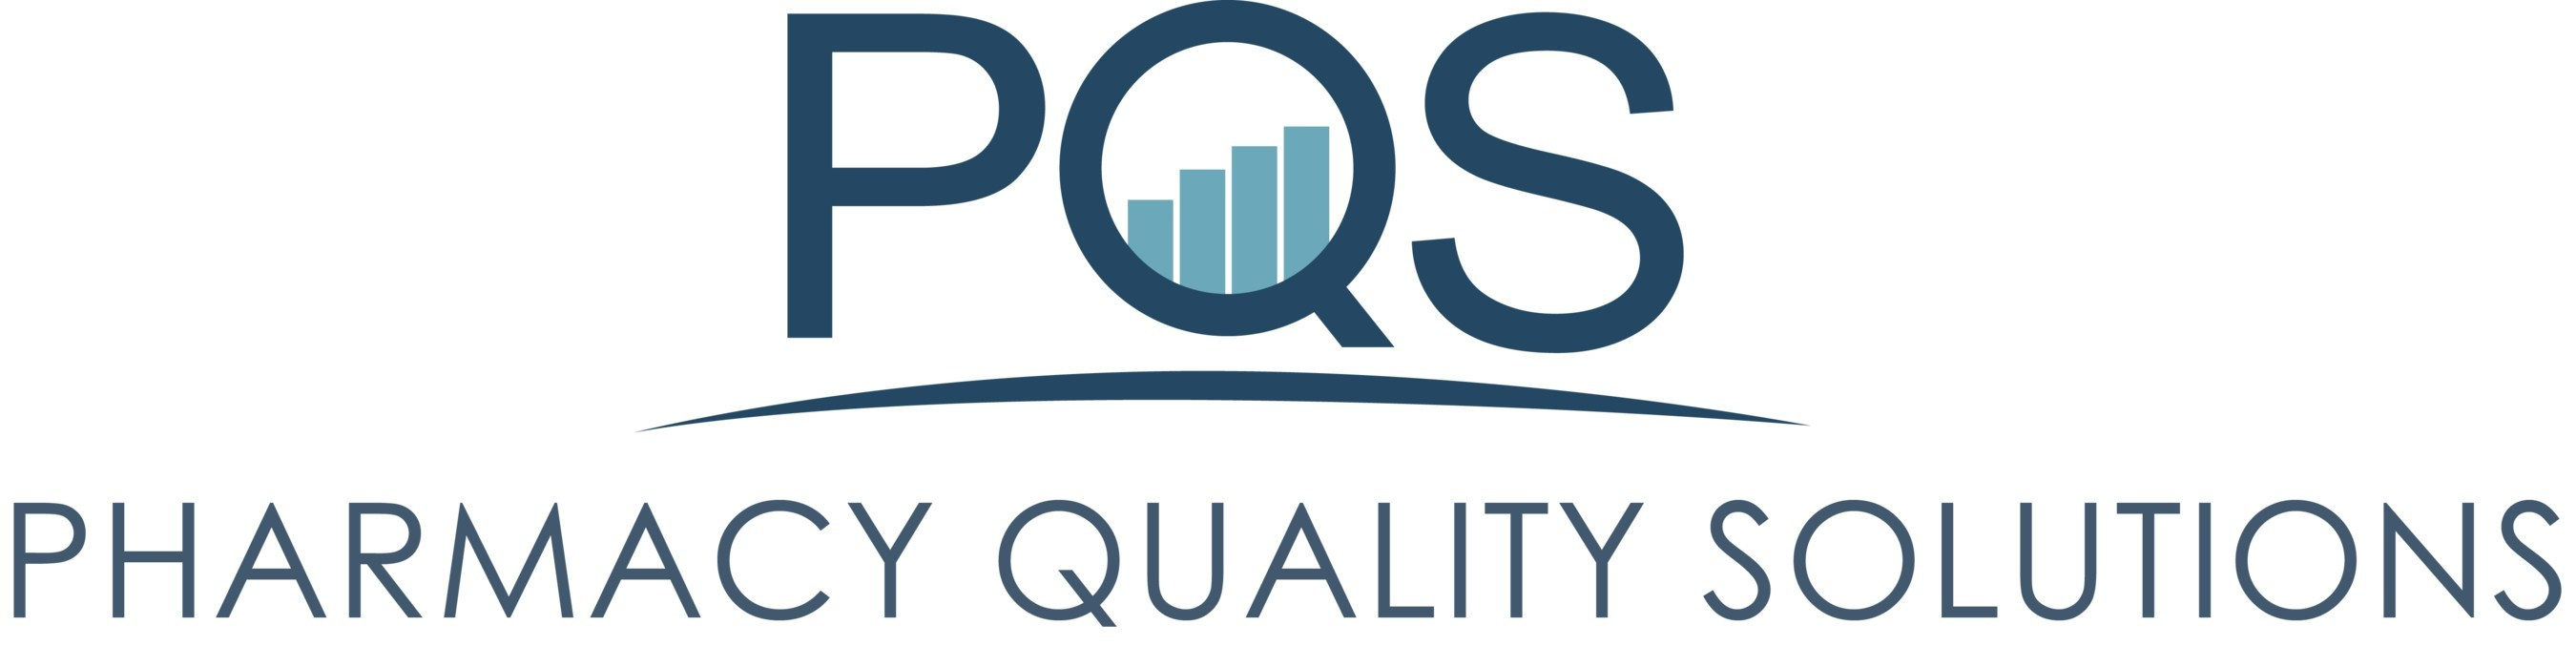 Pharmacy Quality Solutions logo